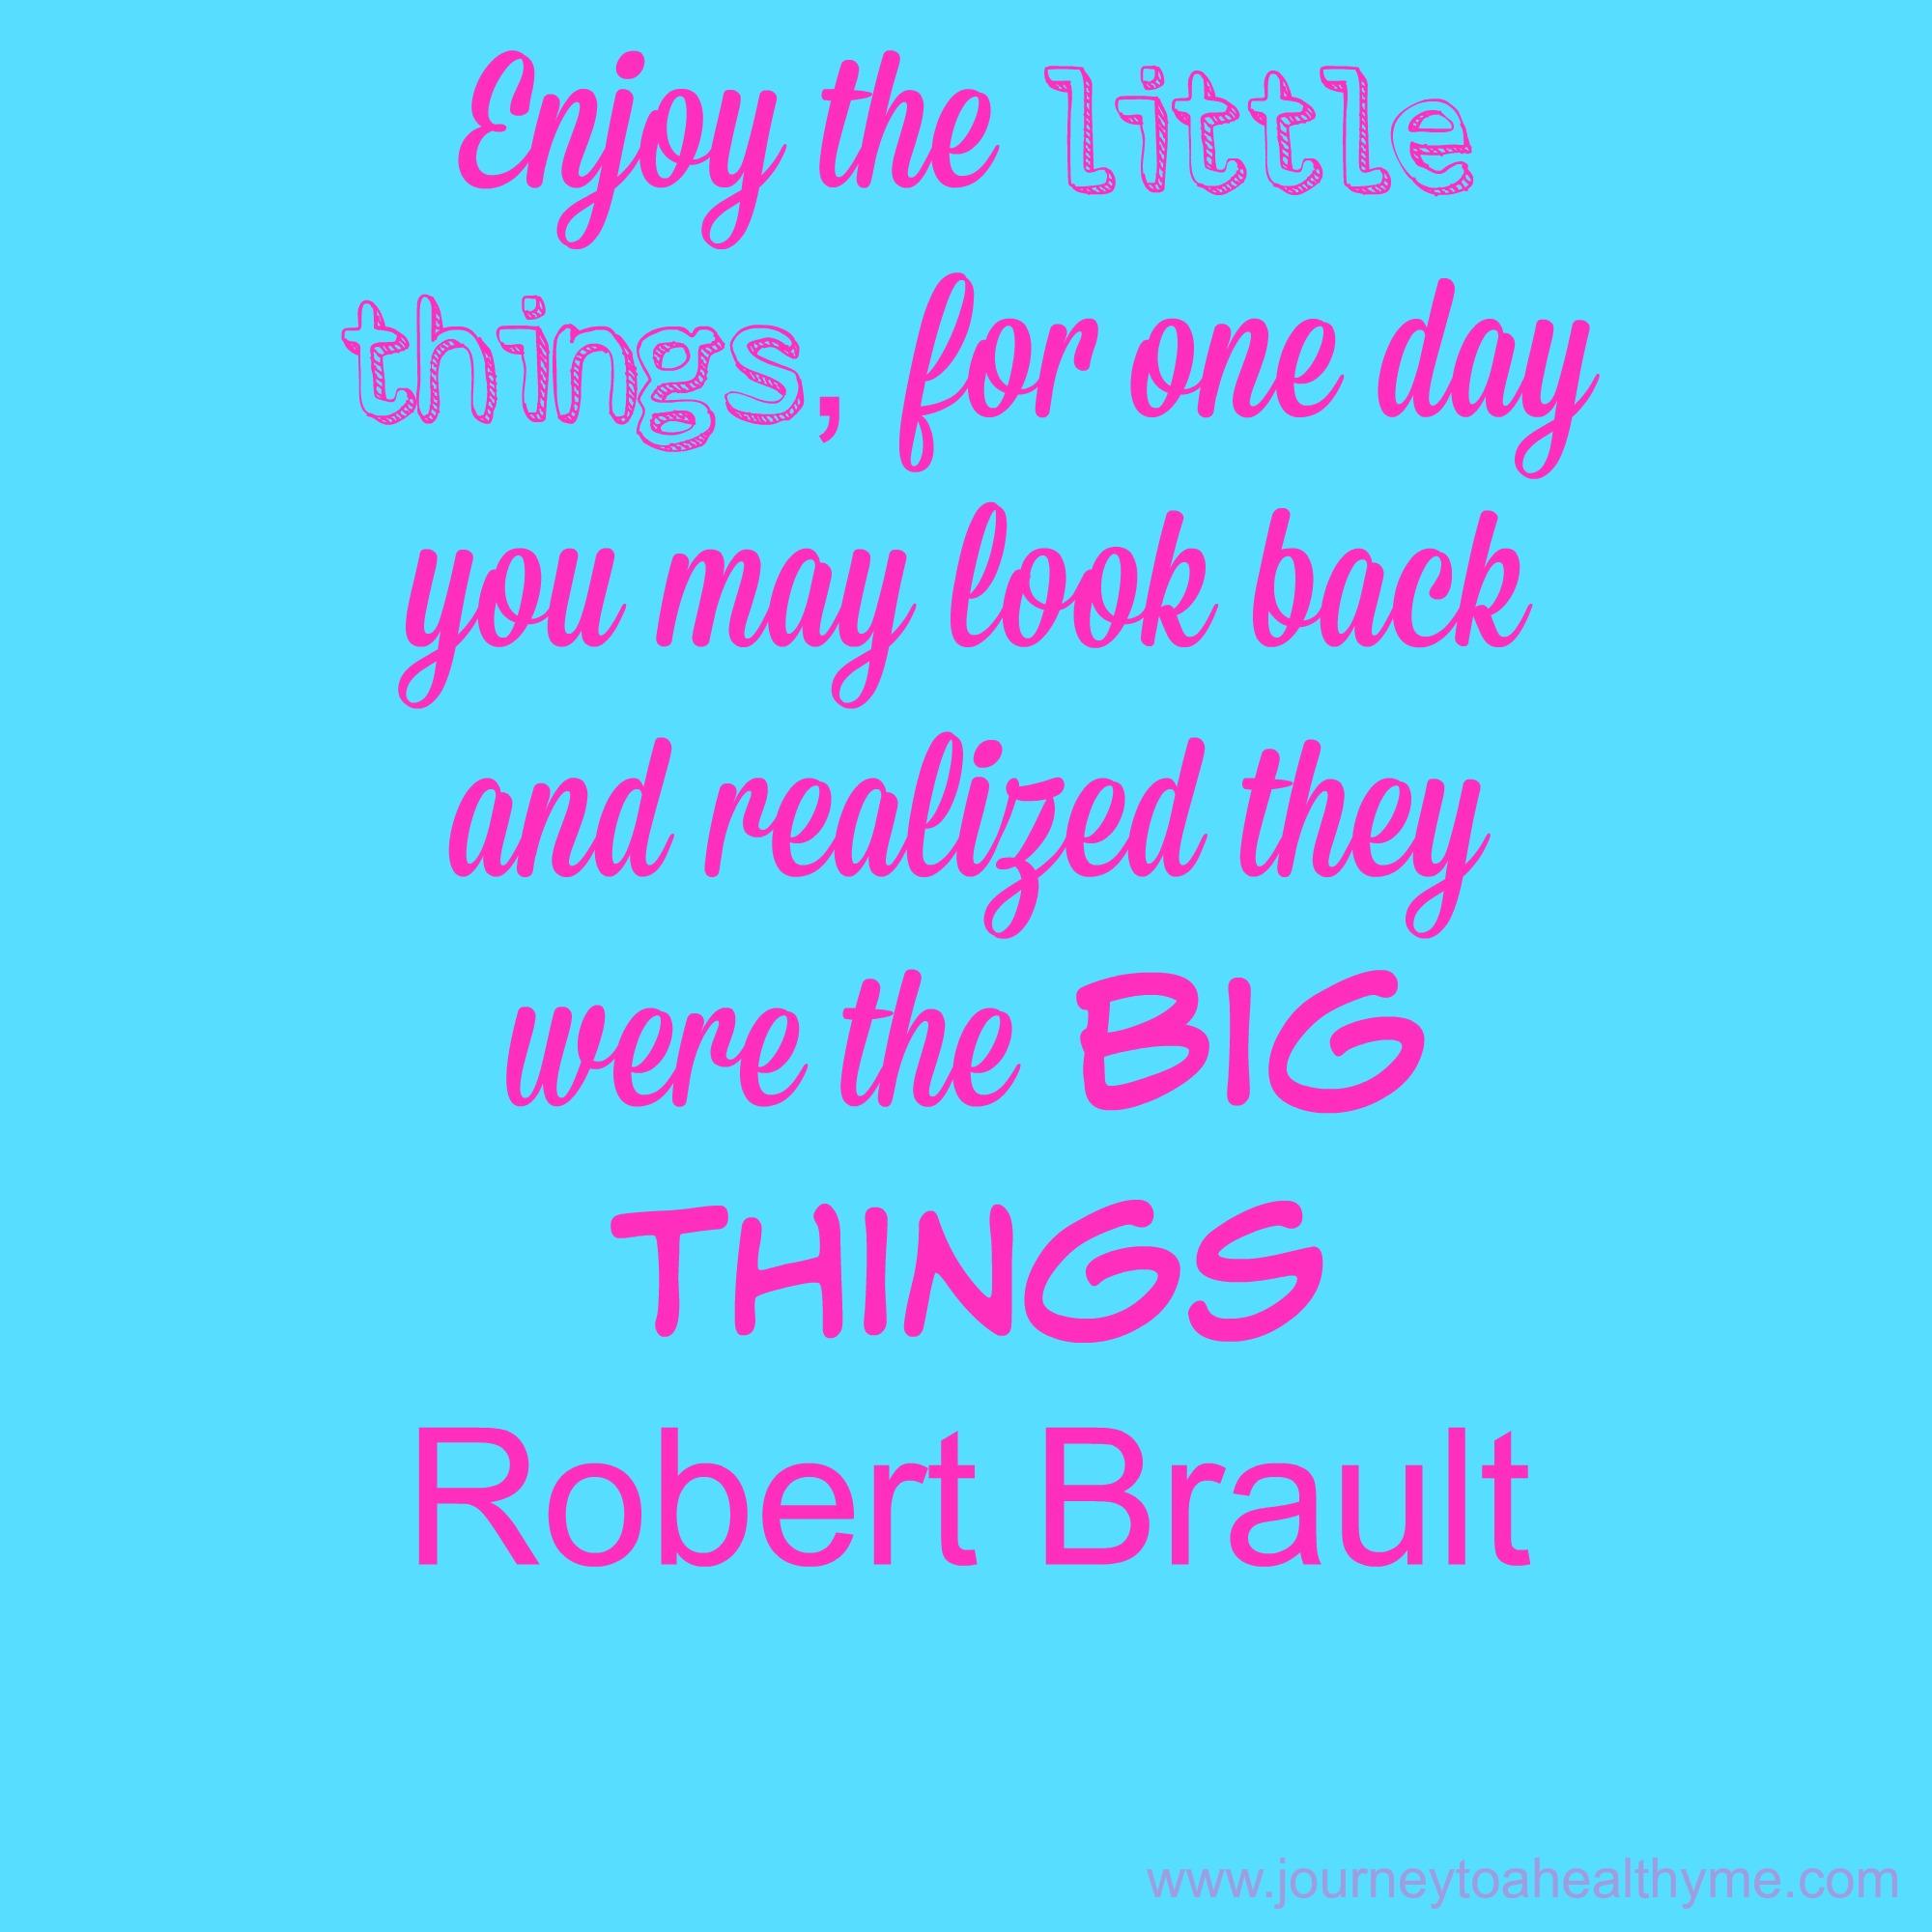 Quotes Gratitude 5 Powerful Quotes On Gratitude